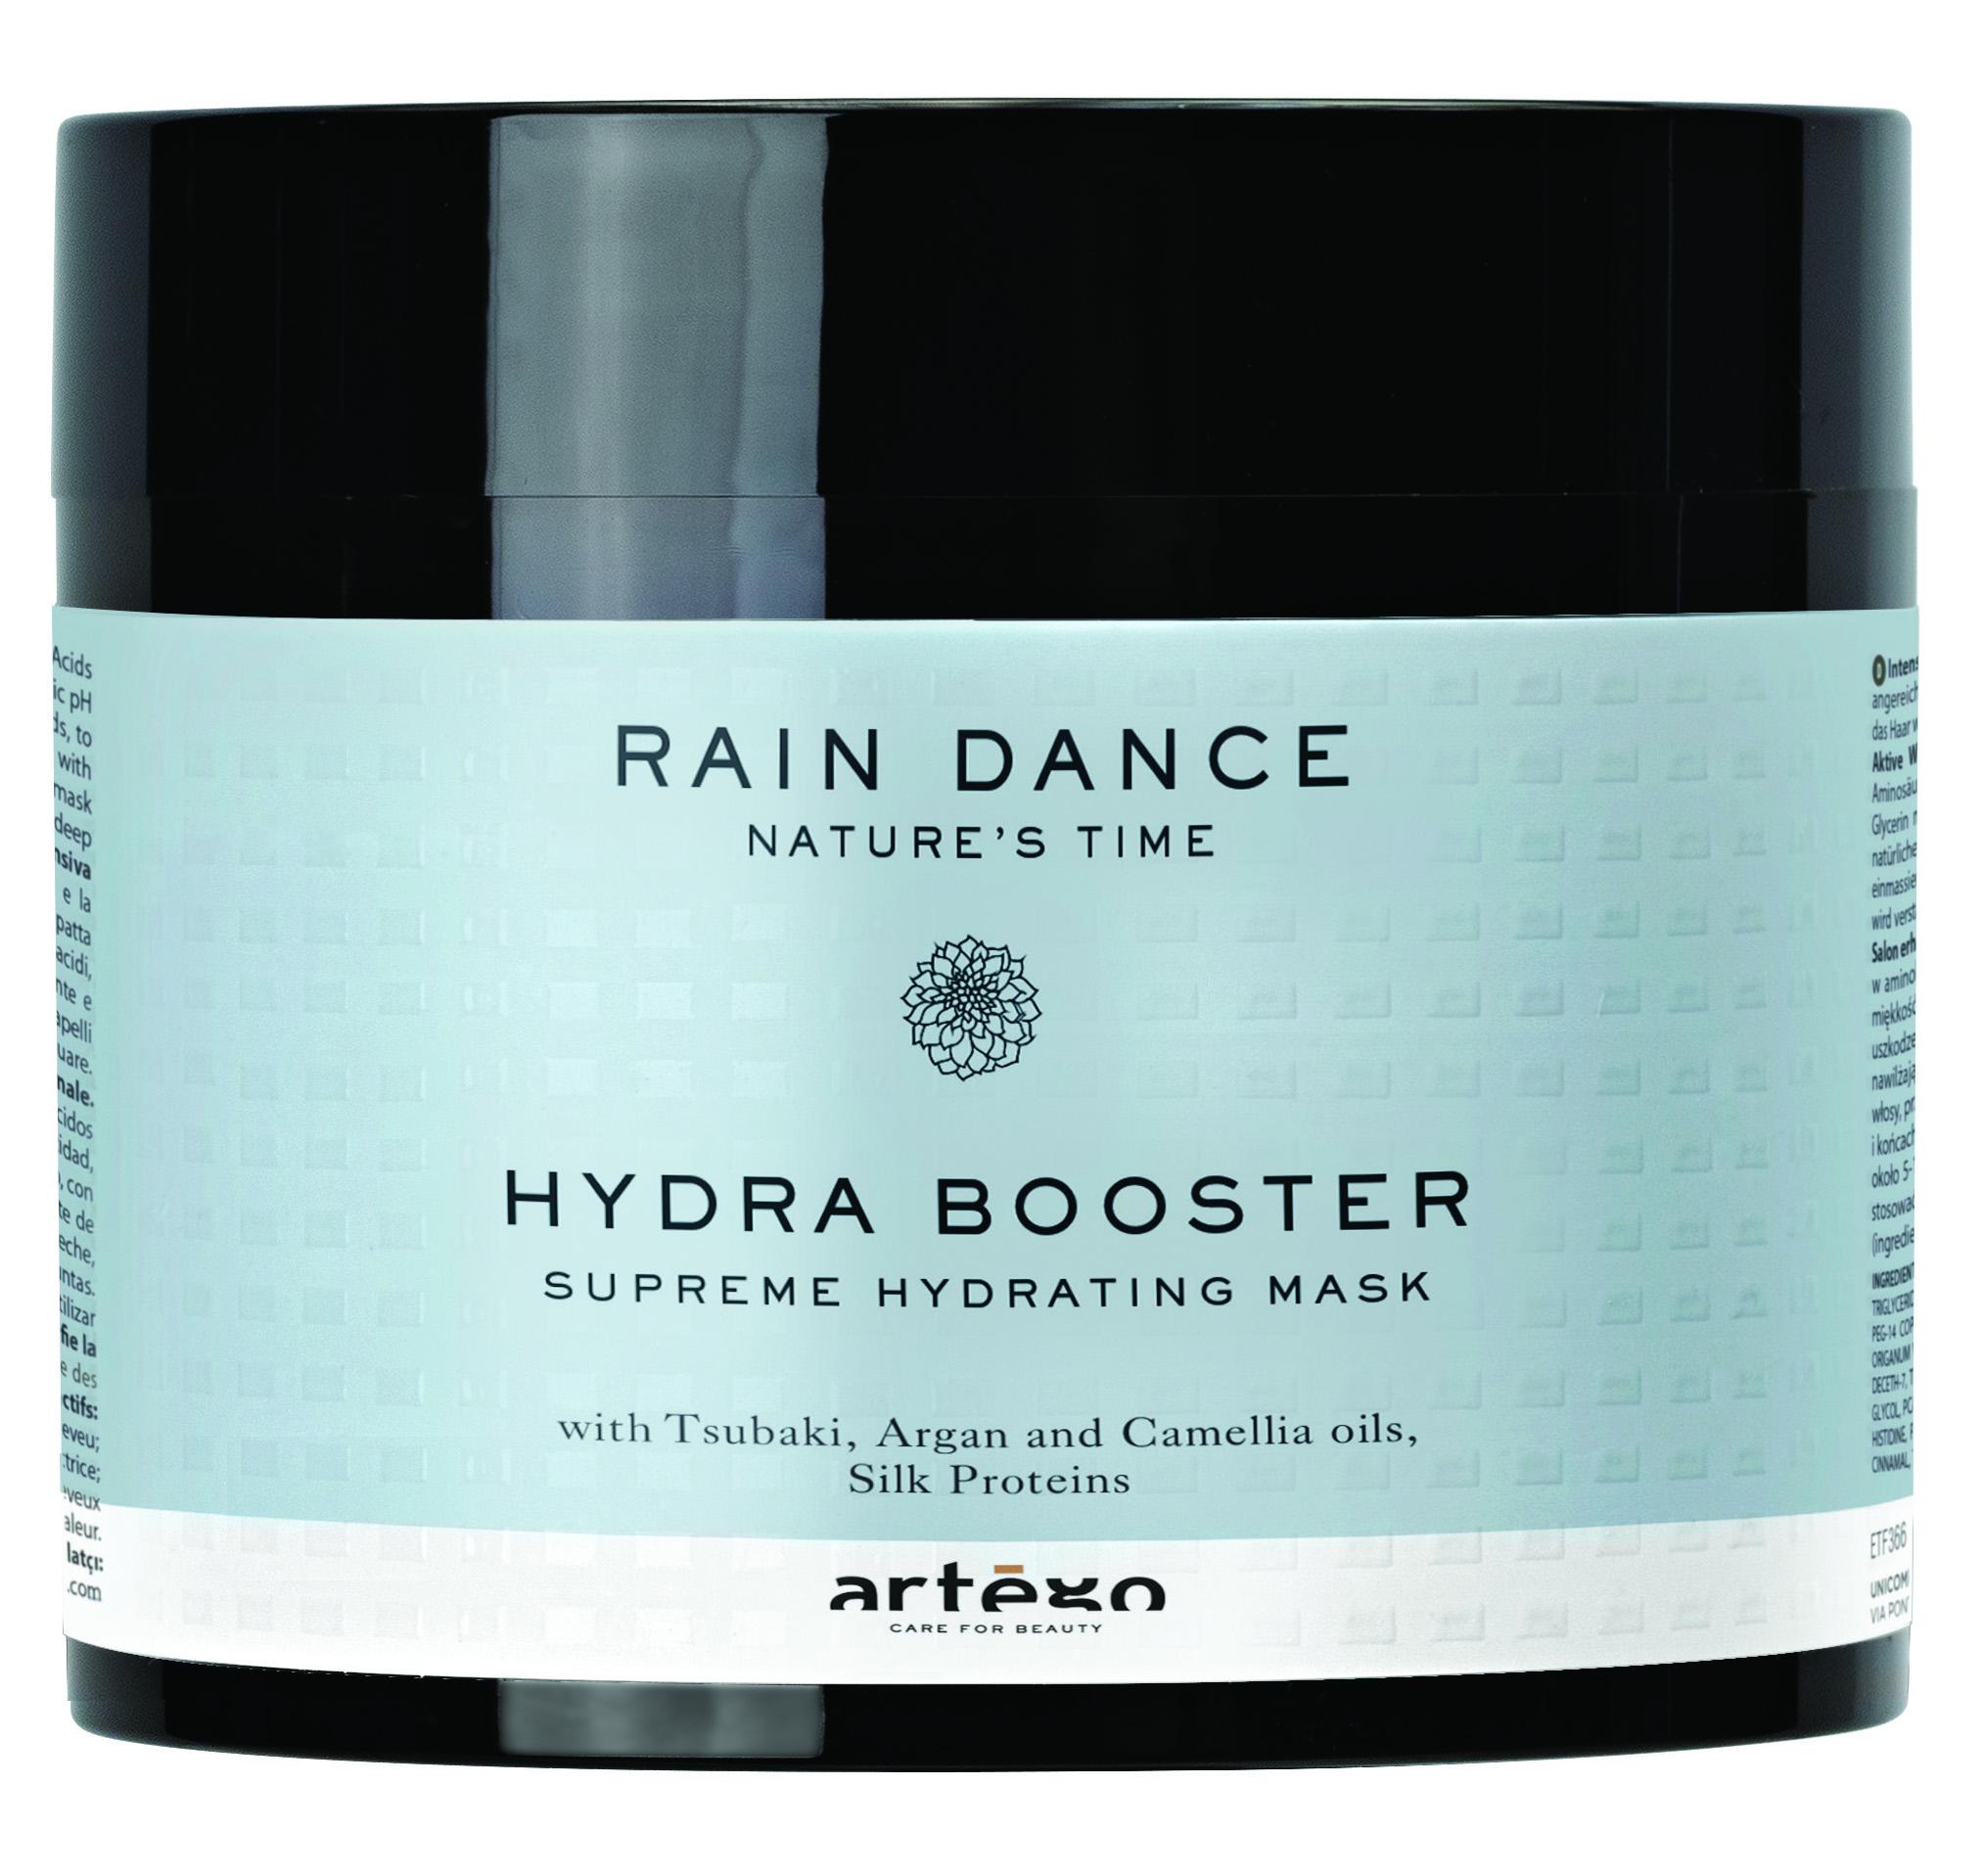 Hydratační maska  RAIN DANCE Artego 500ml- NOVINKA